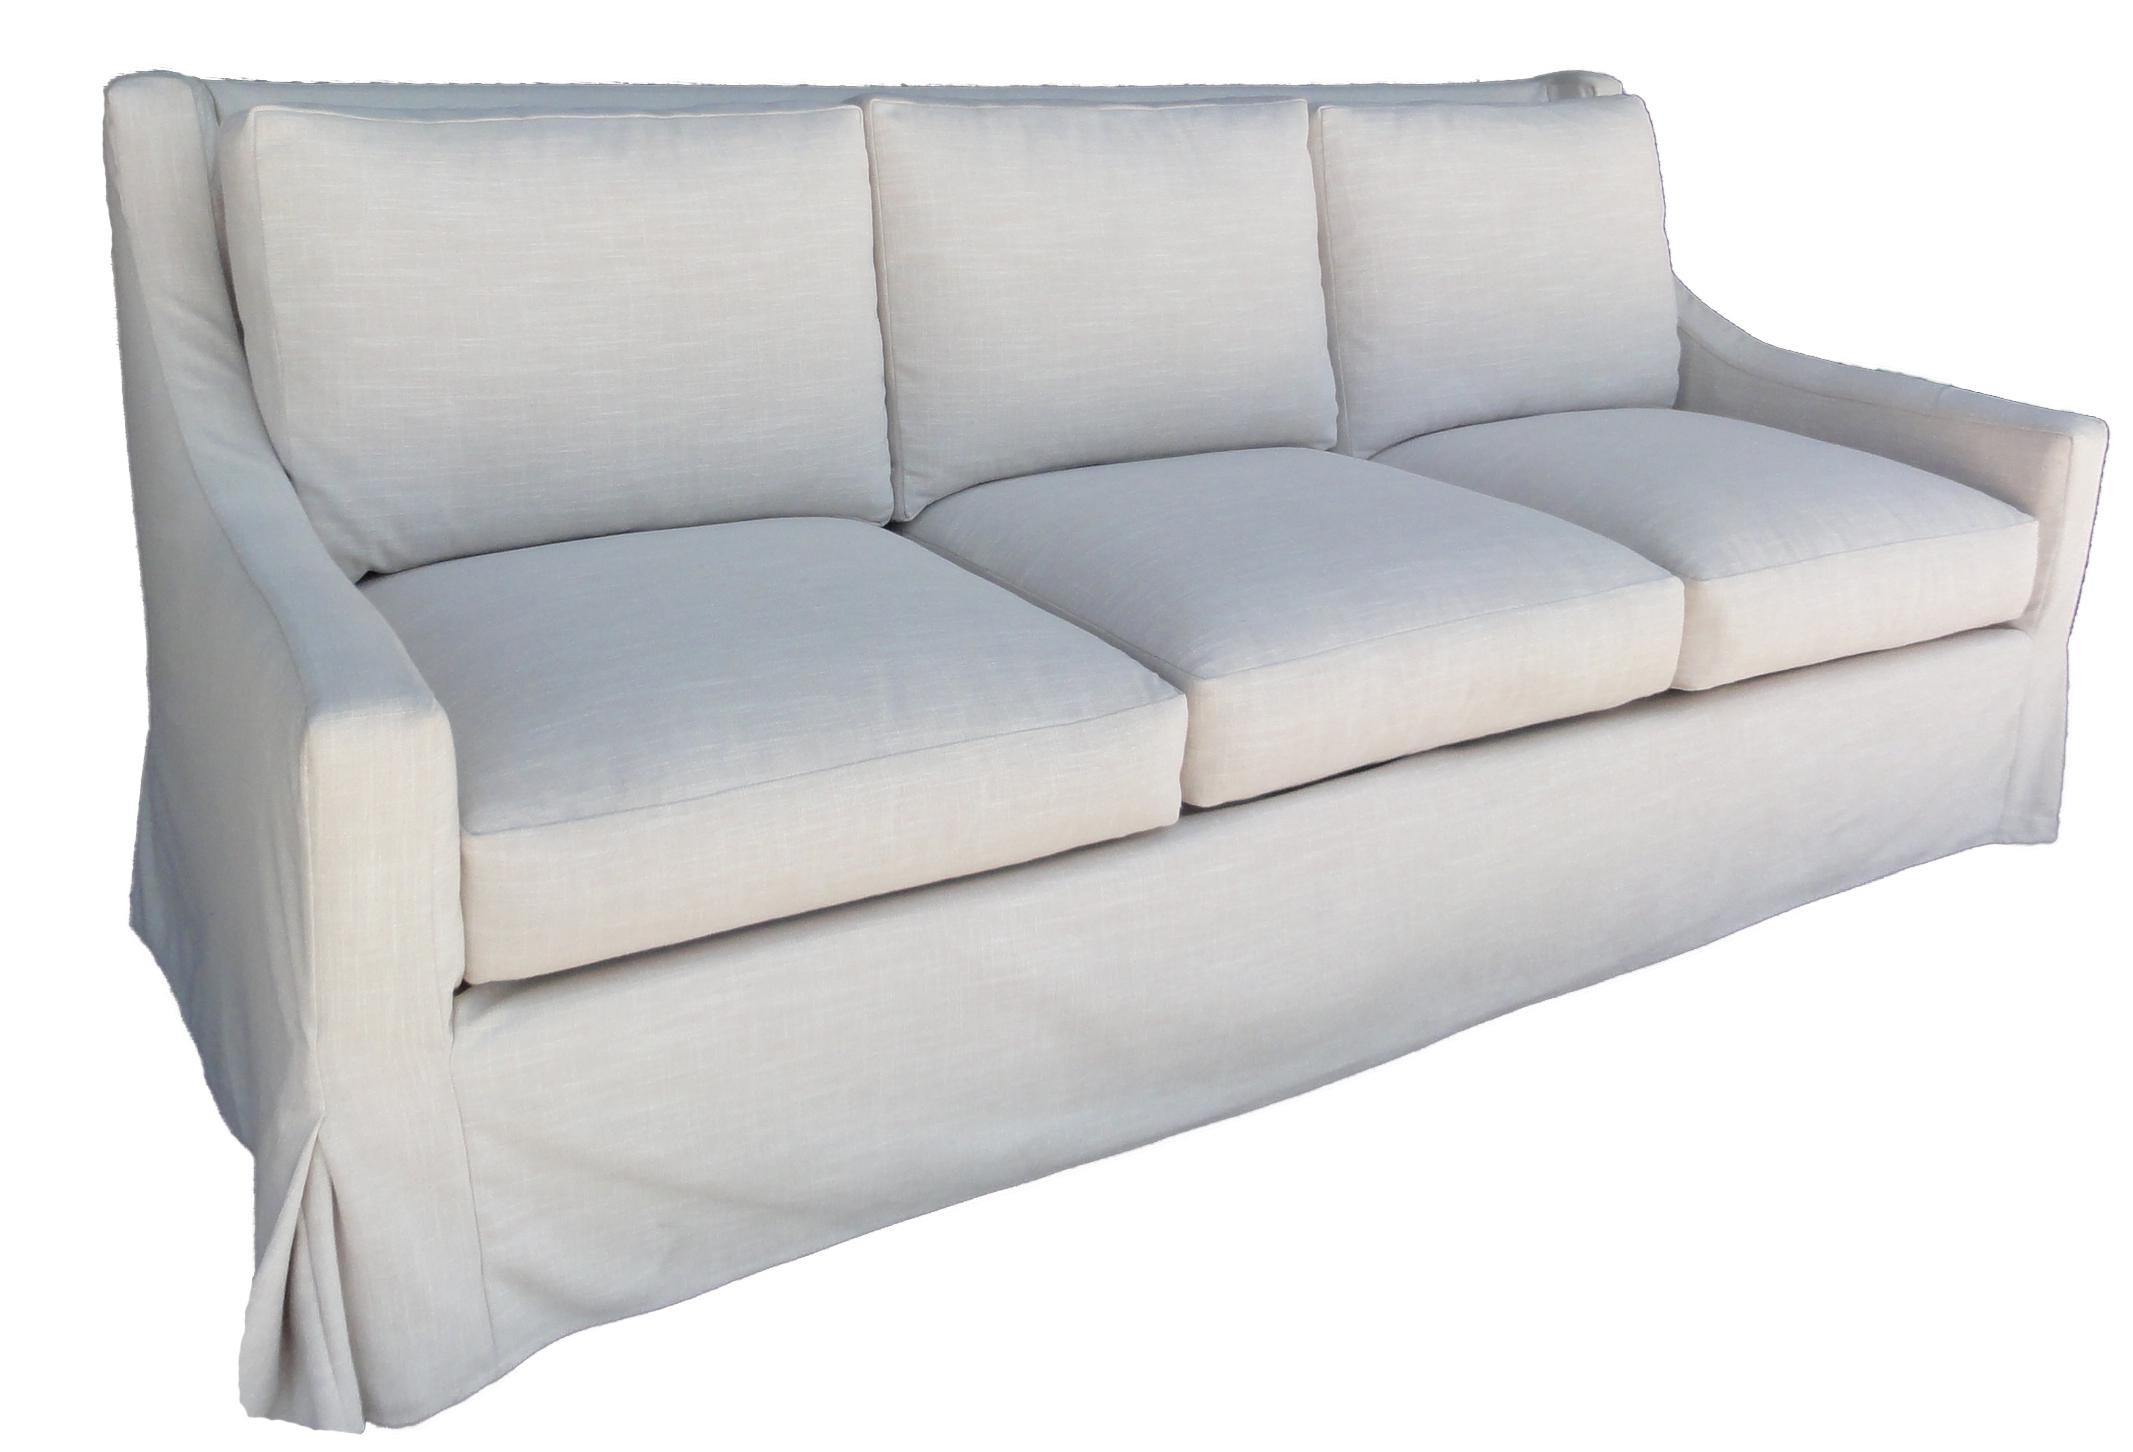 Lauren-sofa-santa-barbara-design-center-2